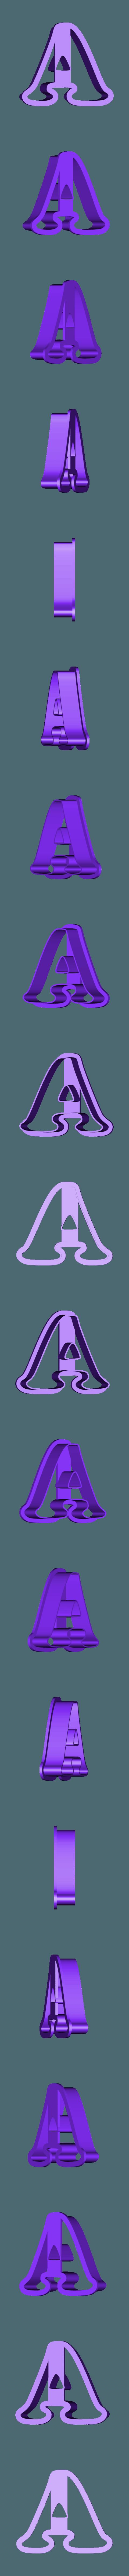 a.stl Download free STL file A-Z alphabet cookie cutter • 3D printer design, BlackSand3DMaker